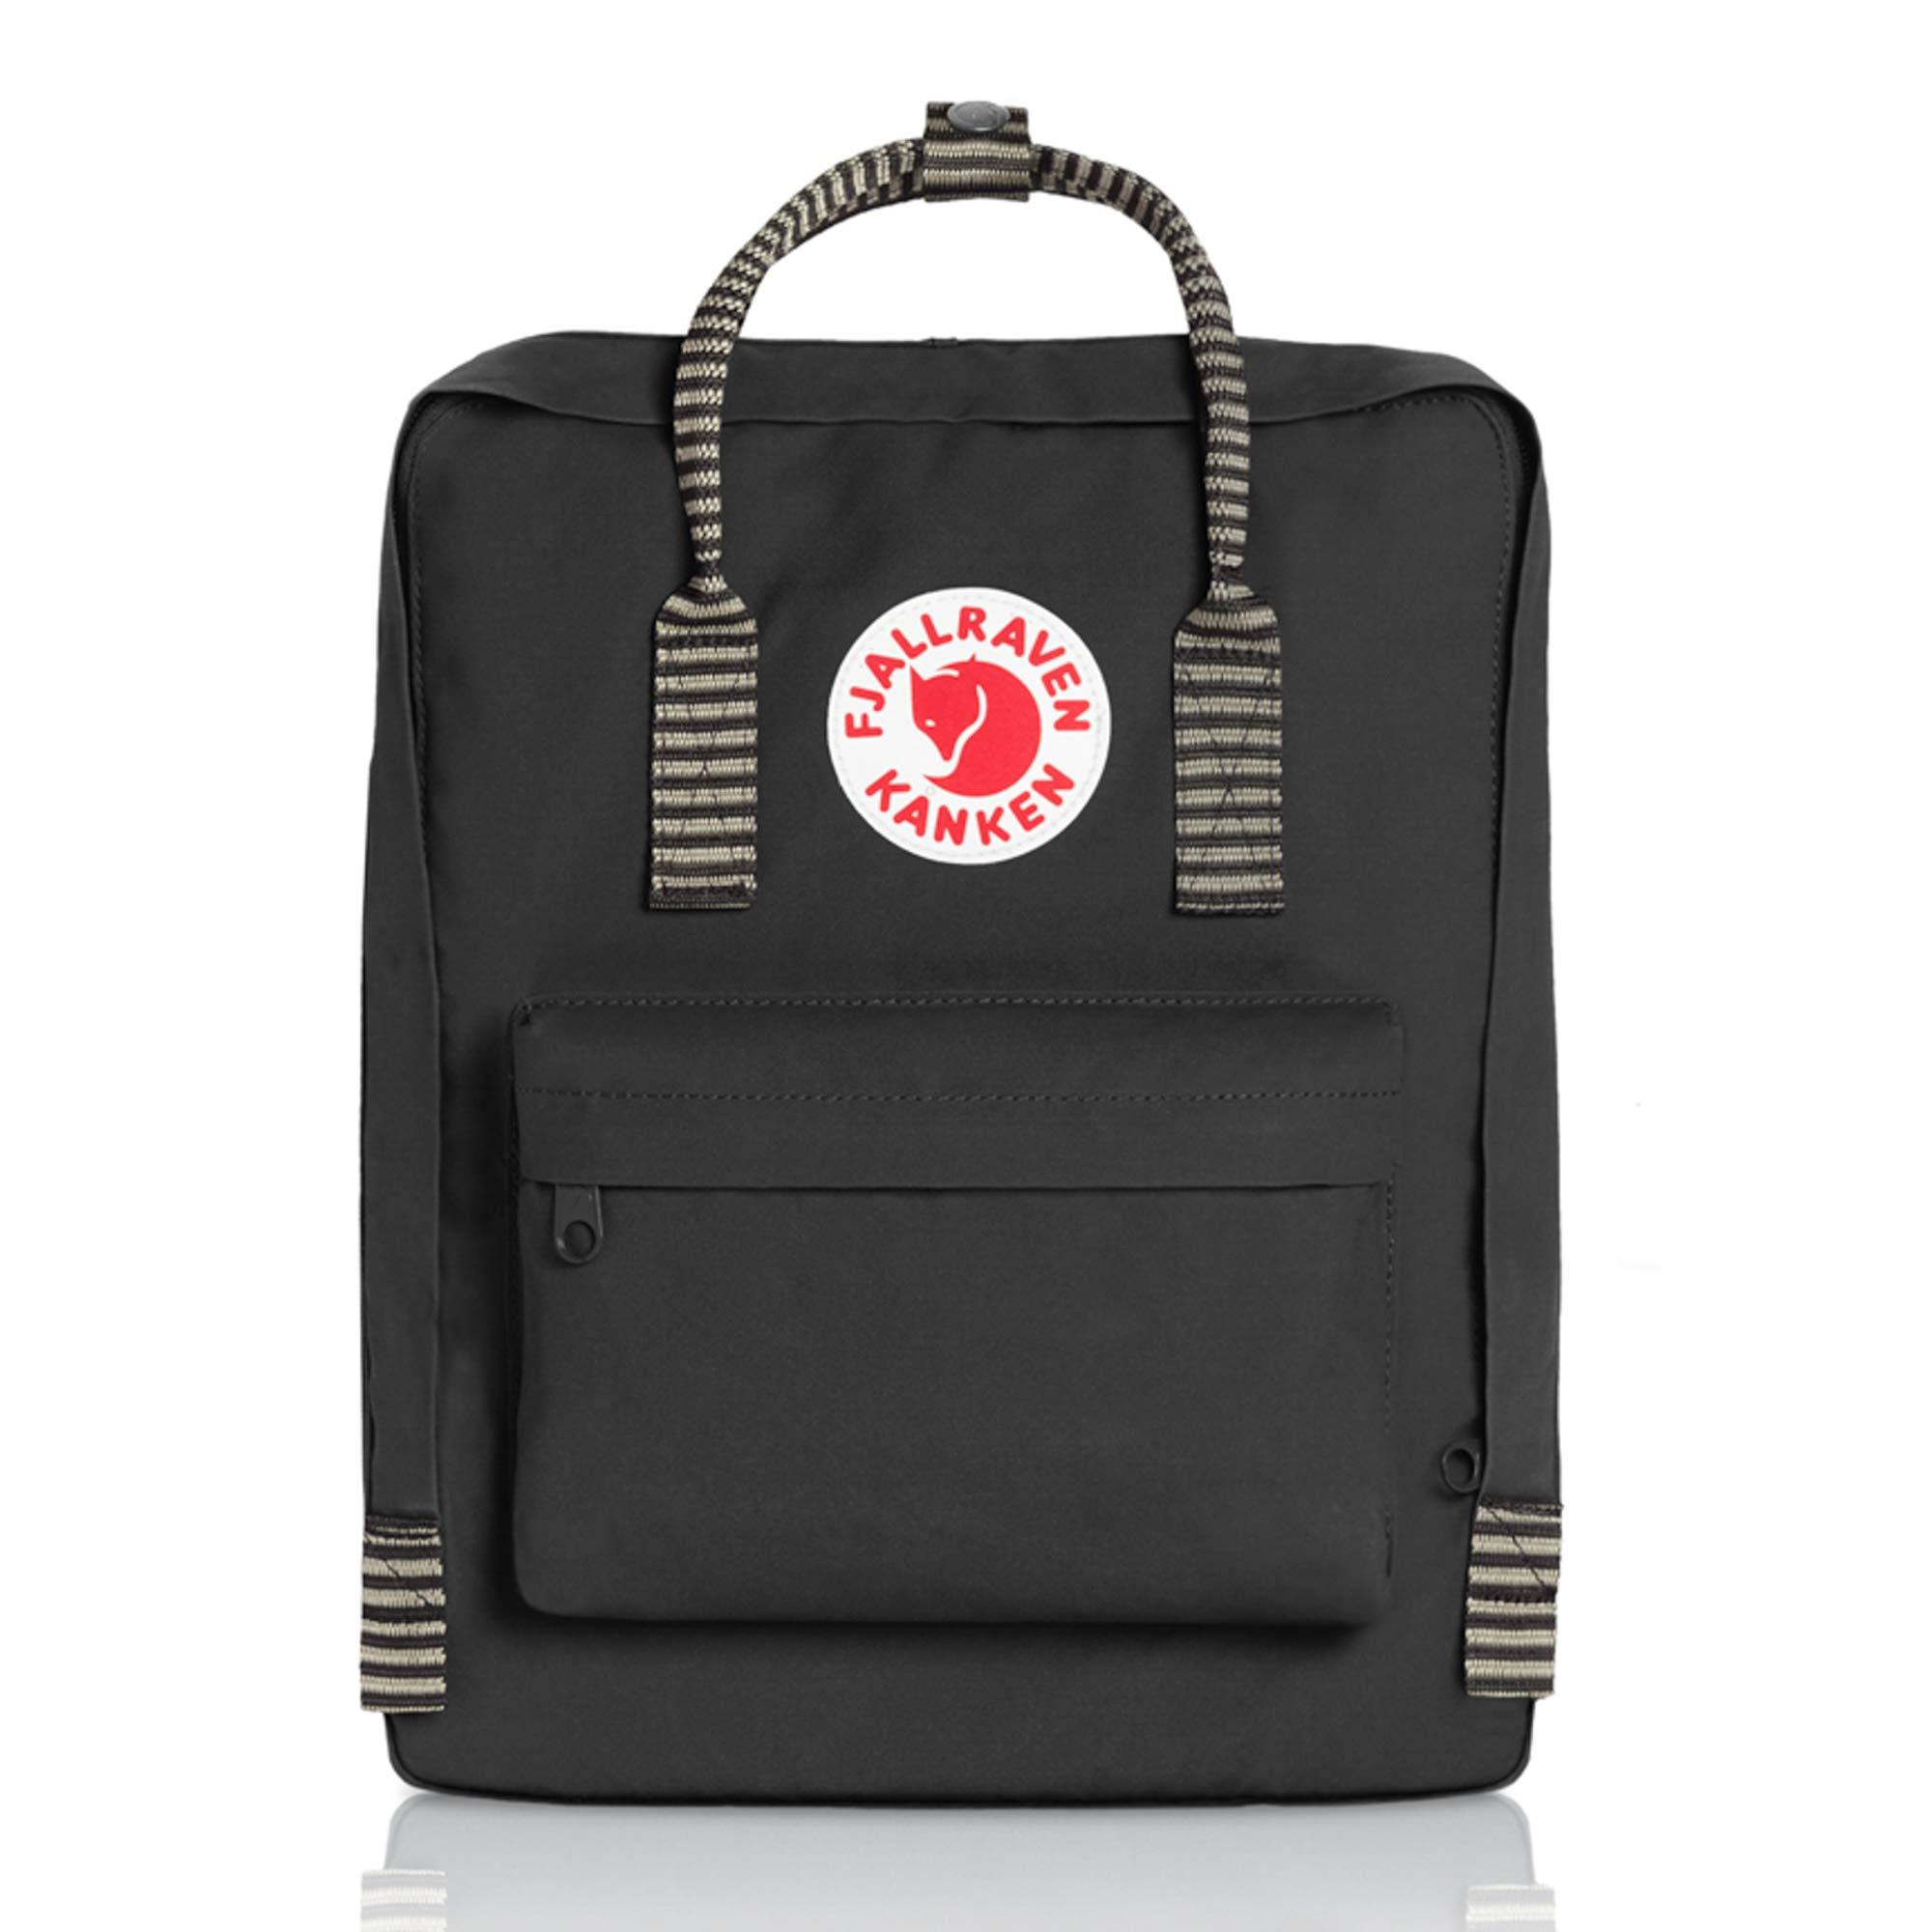 Fjallraven - Kanken Classic Backpack for Everyday, Black-Striped